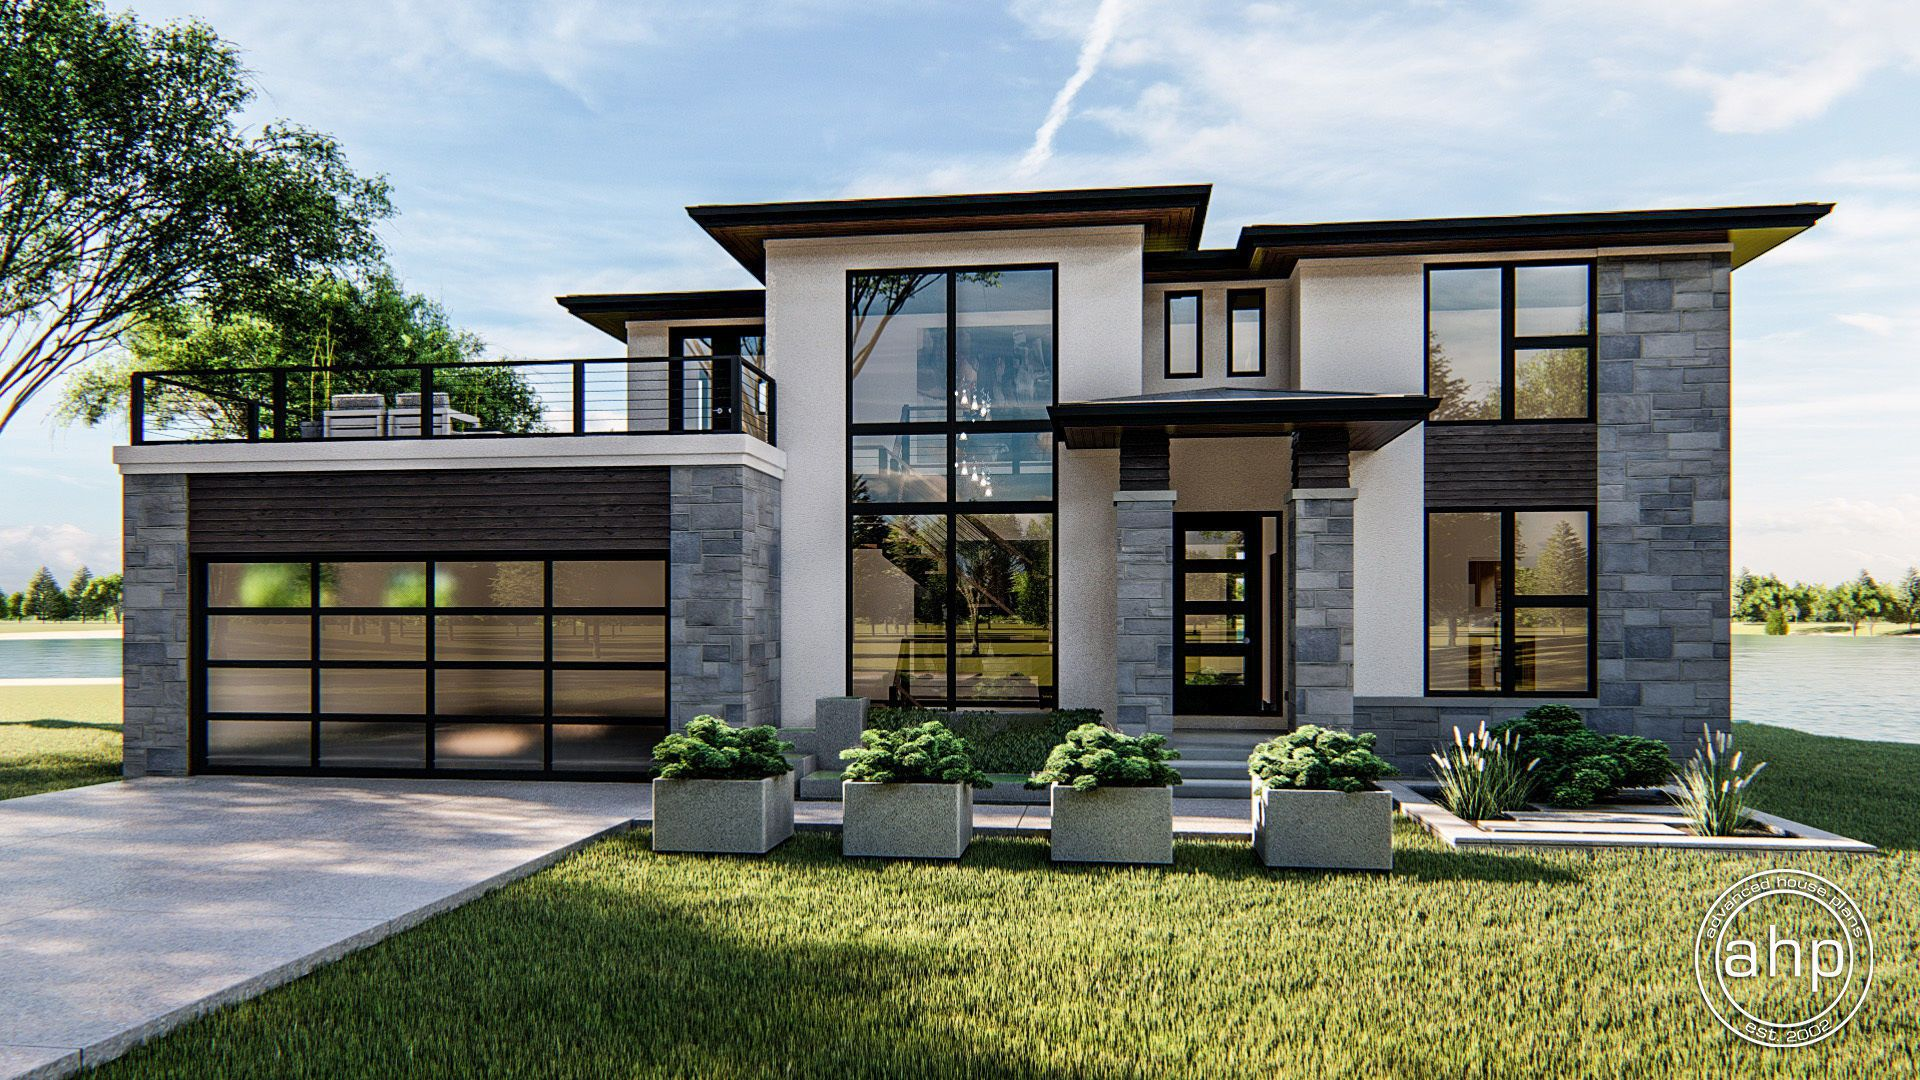 1 5 Story Modern Prairie House Plan Summit Prairie Style Houses Modern Style House Plans House Designs Exterior